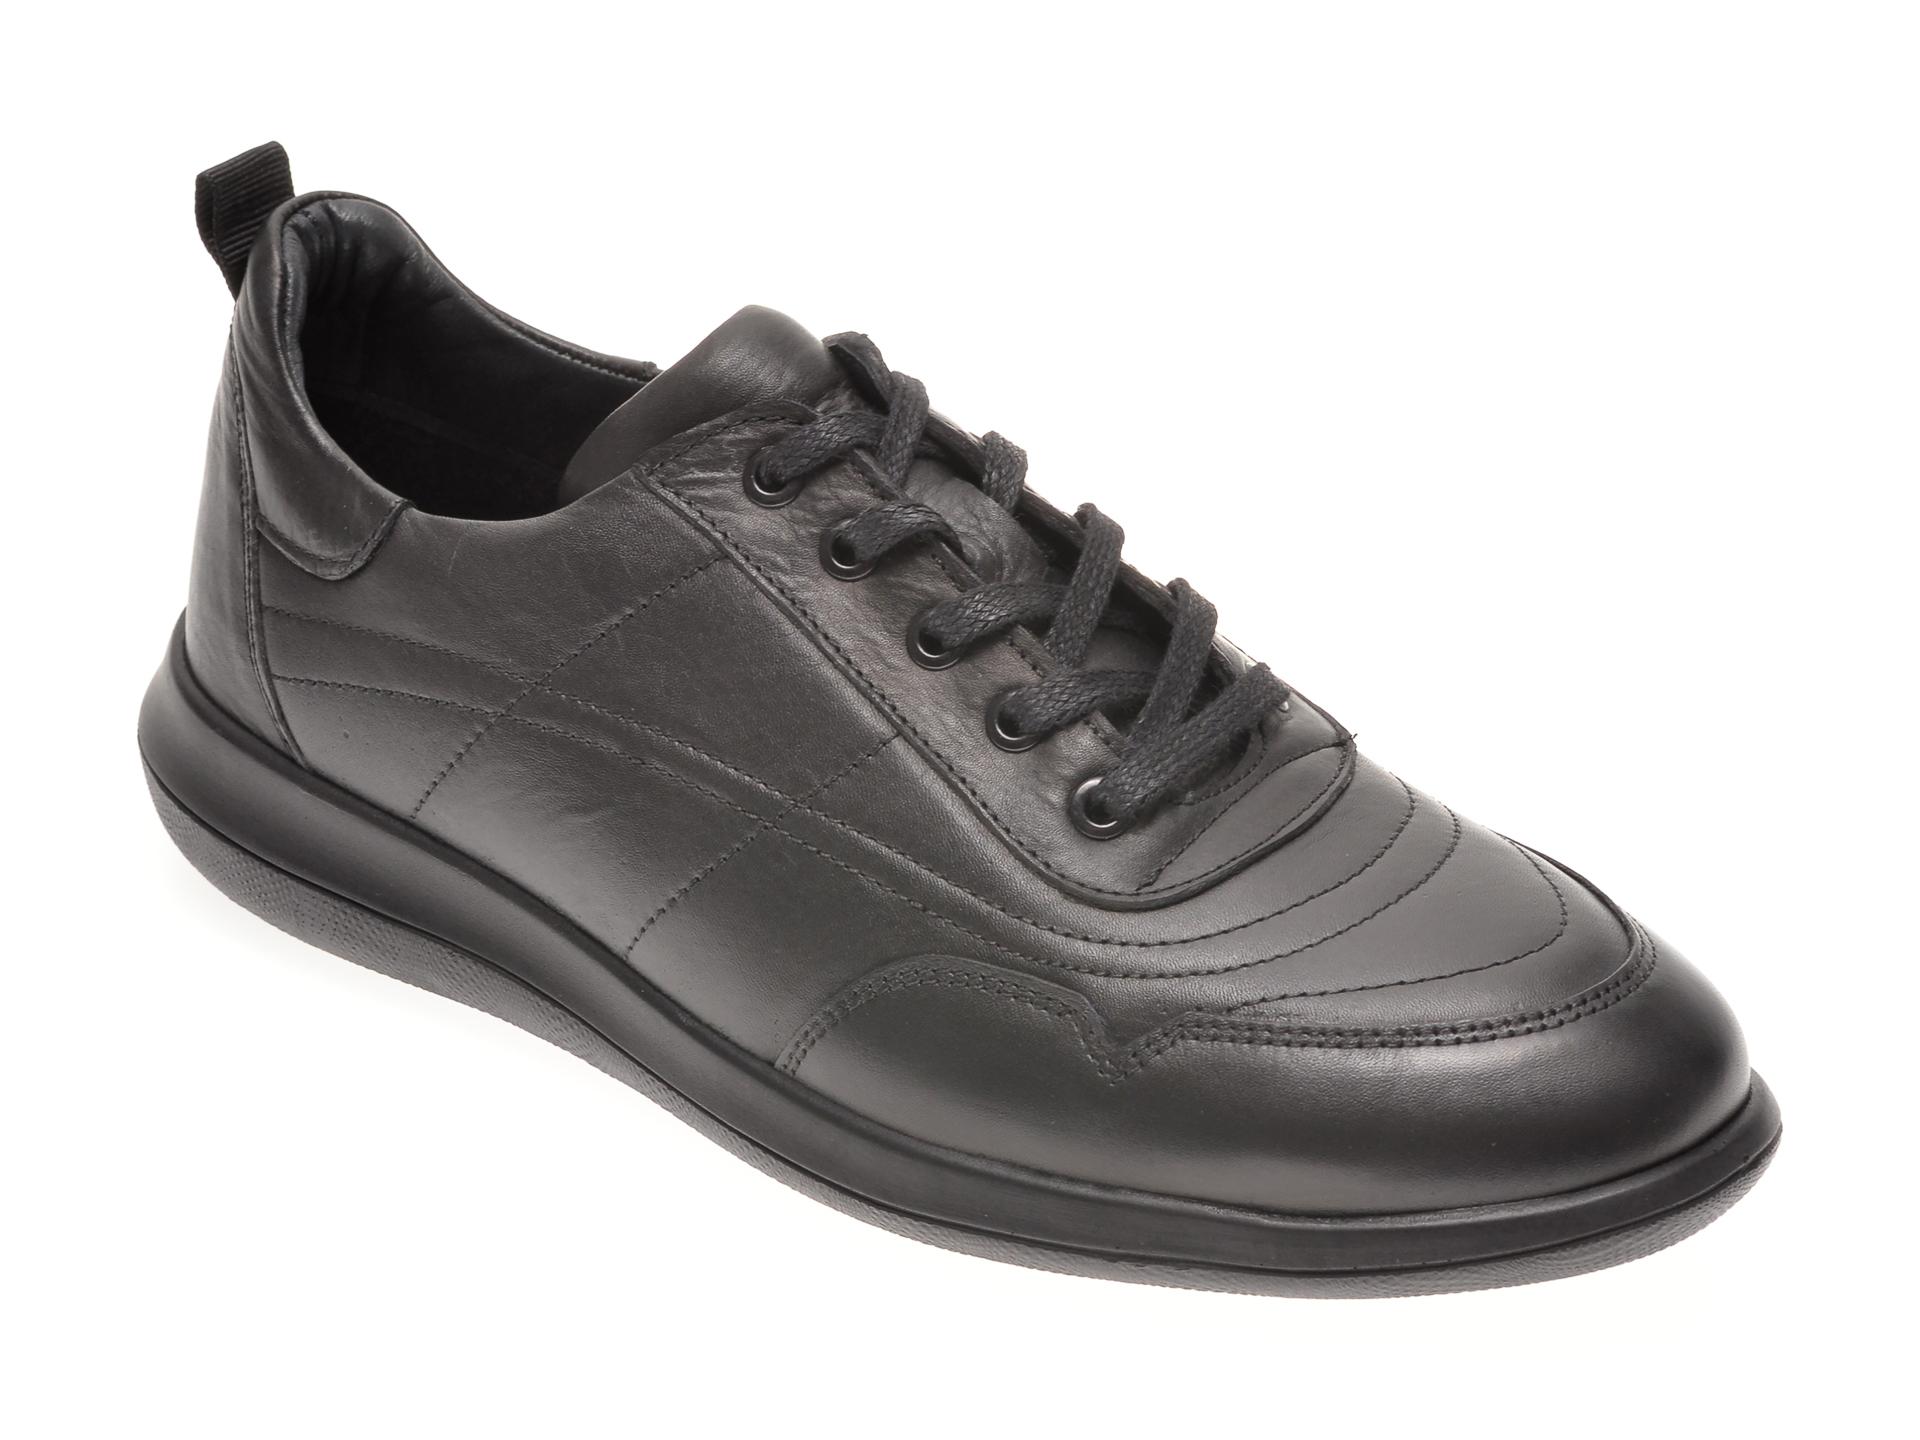 Pantofi OTTER negri, 180609, din piele naturala New